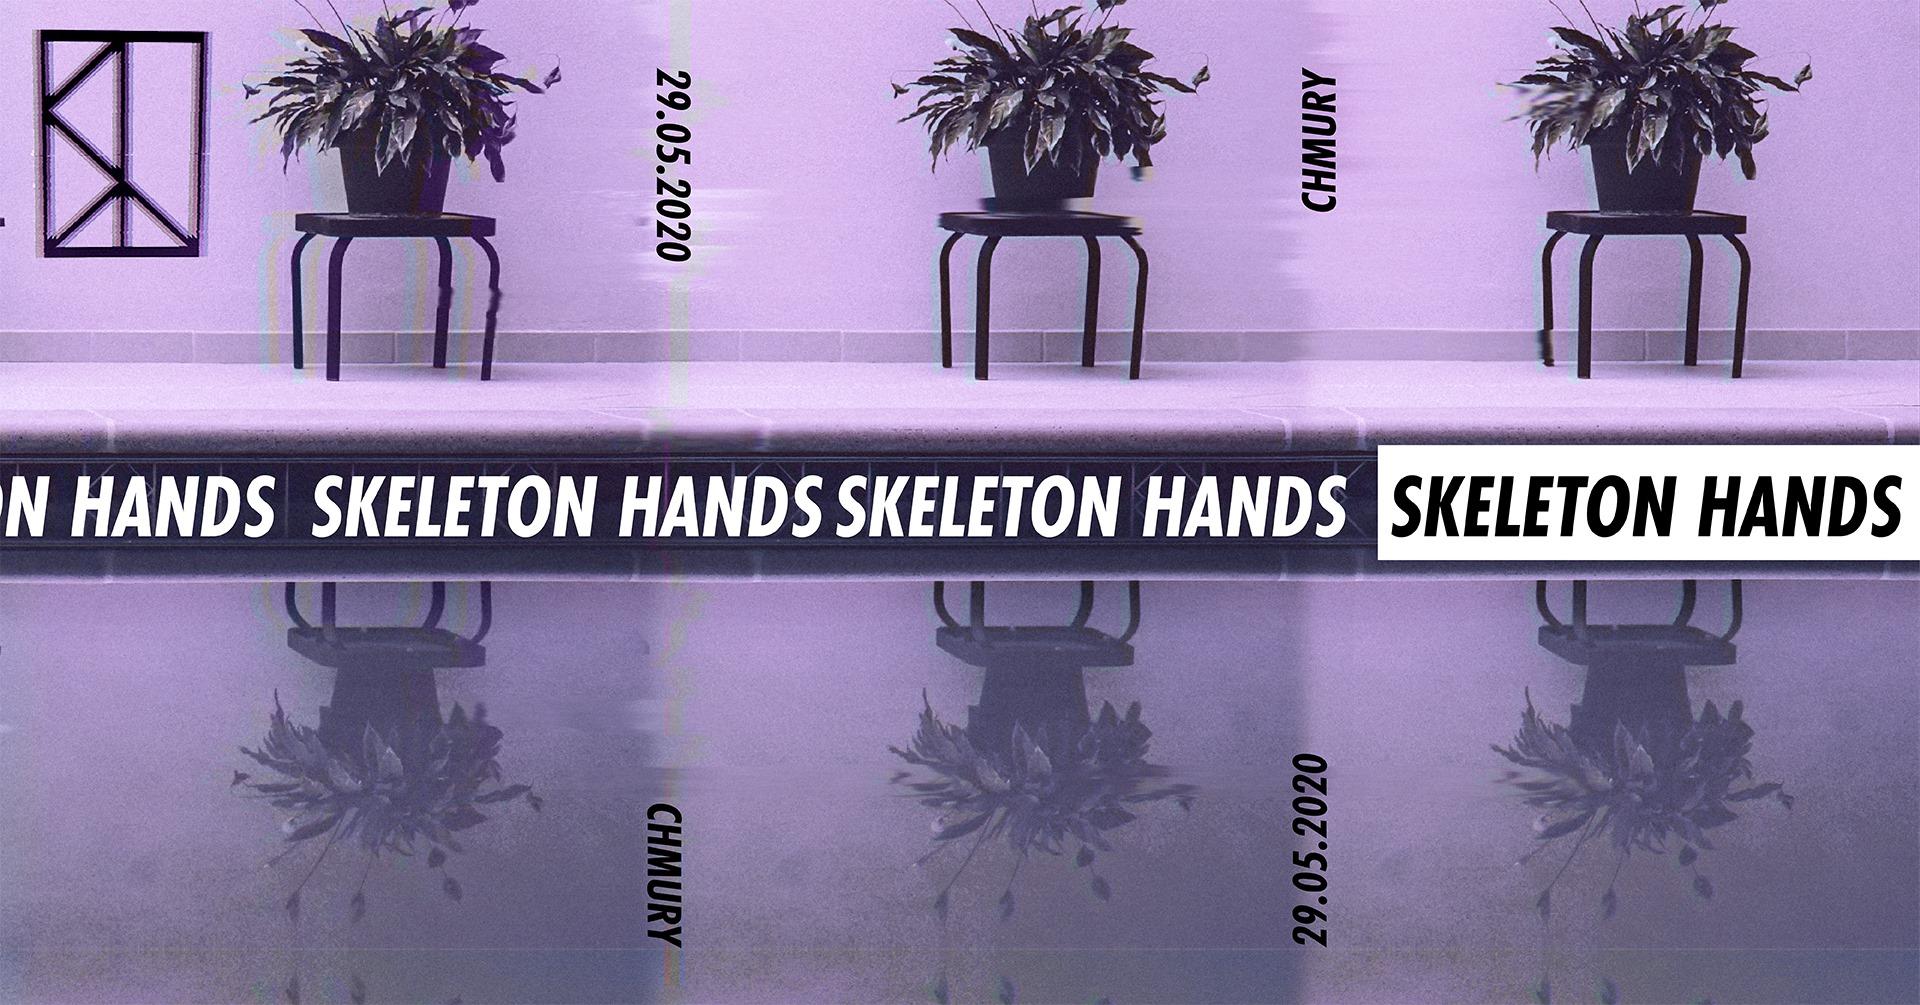 Skeleton Hands (Chmury - Warszawa - 29.05.2020)